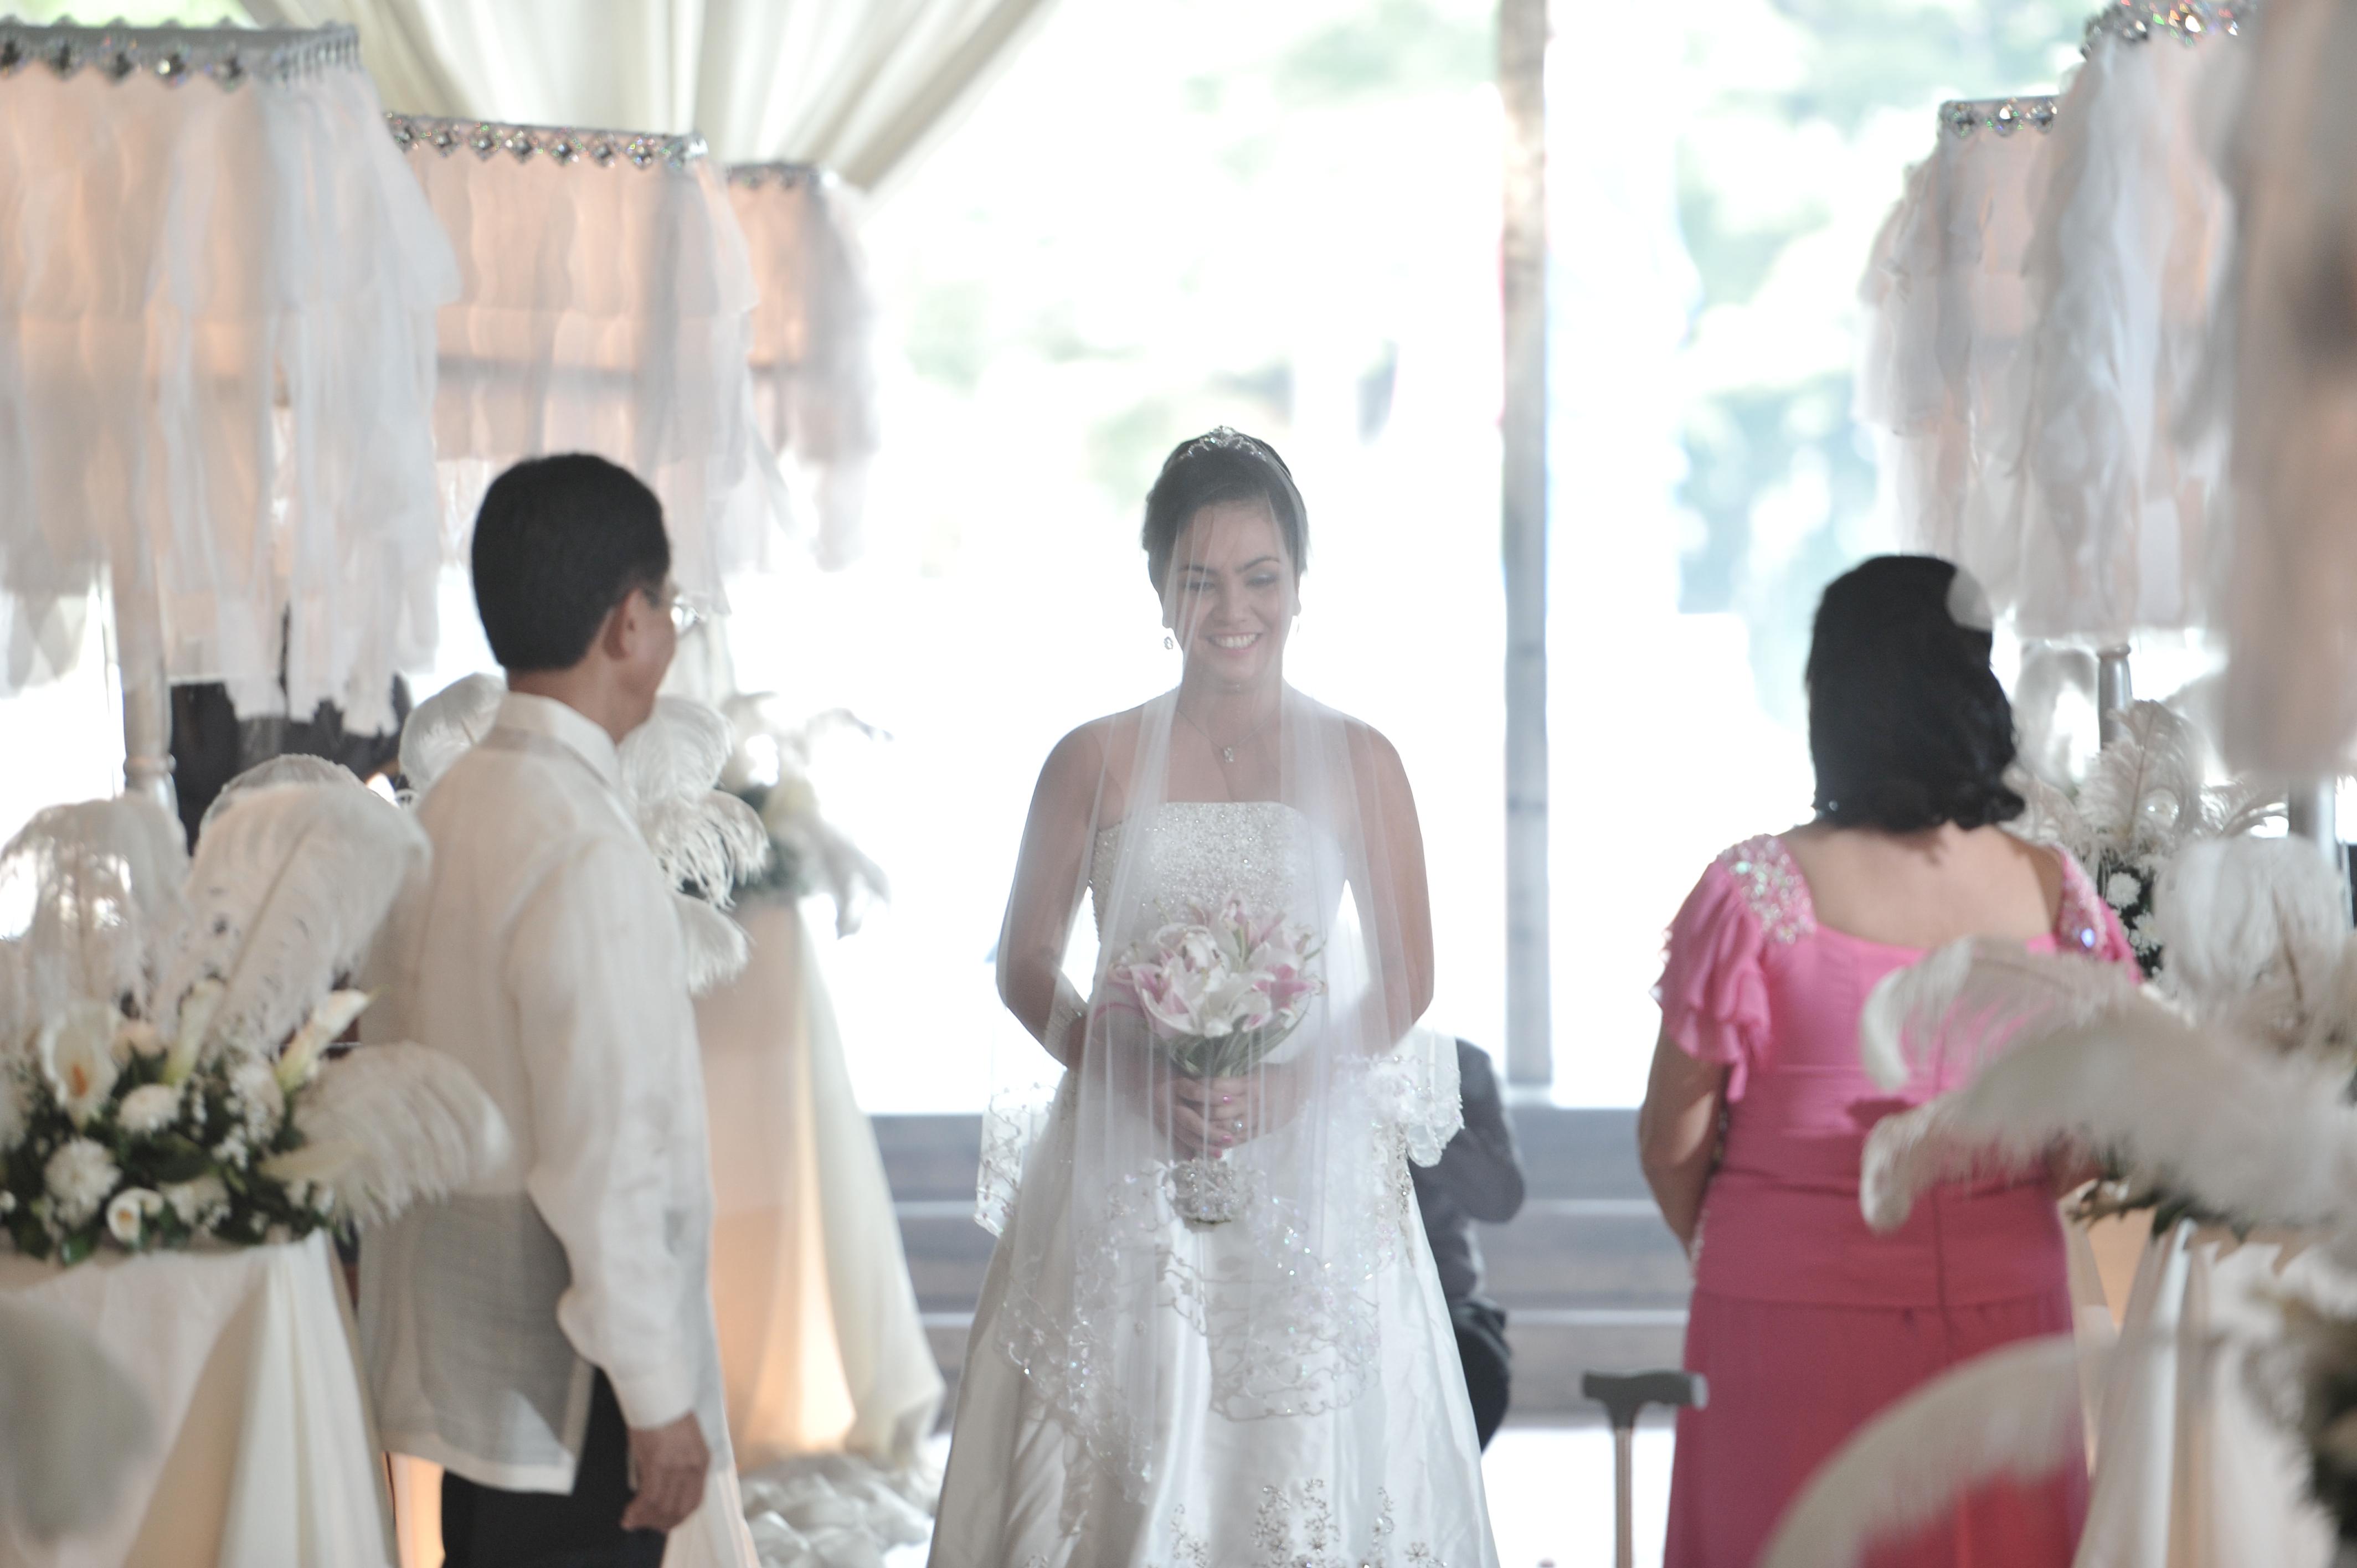 entourage gowns wedding channel sgs_1055 sgs_1065